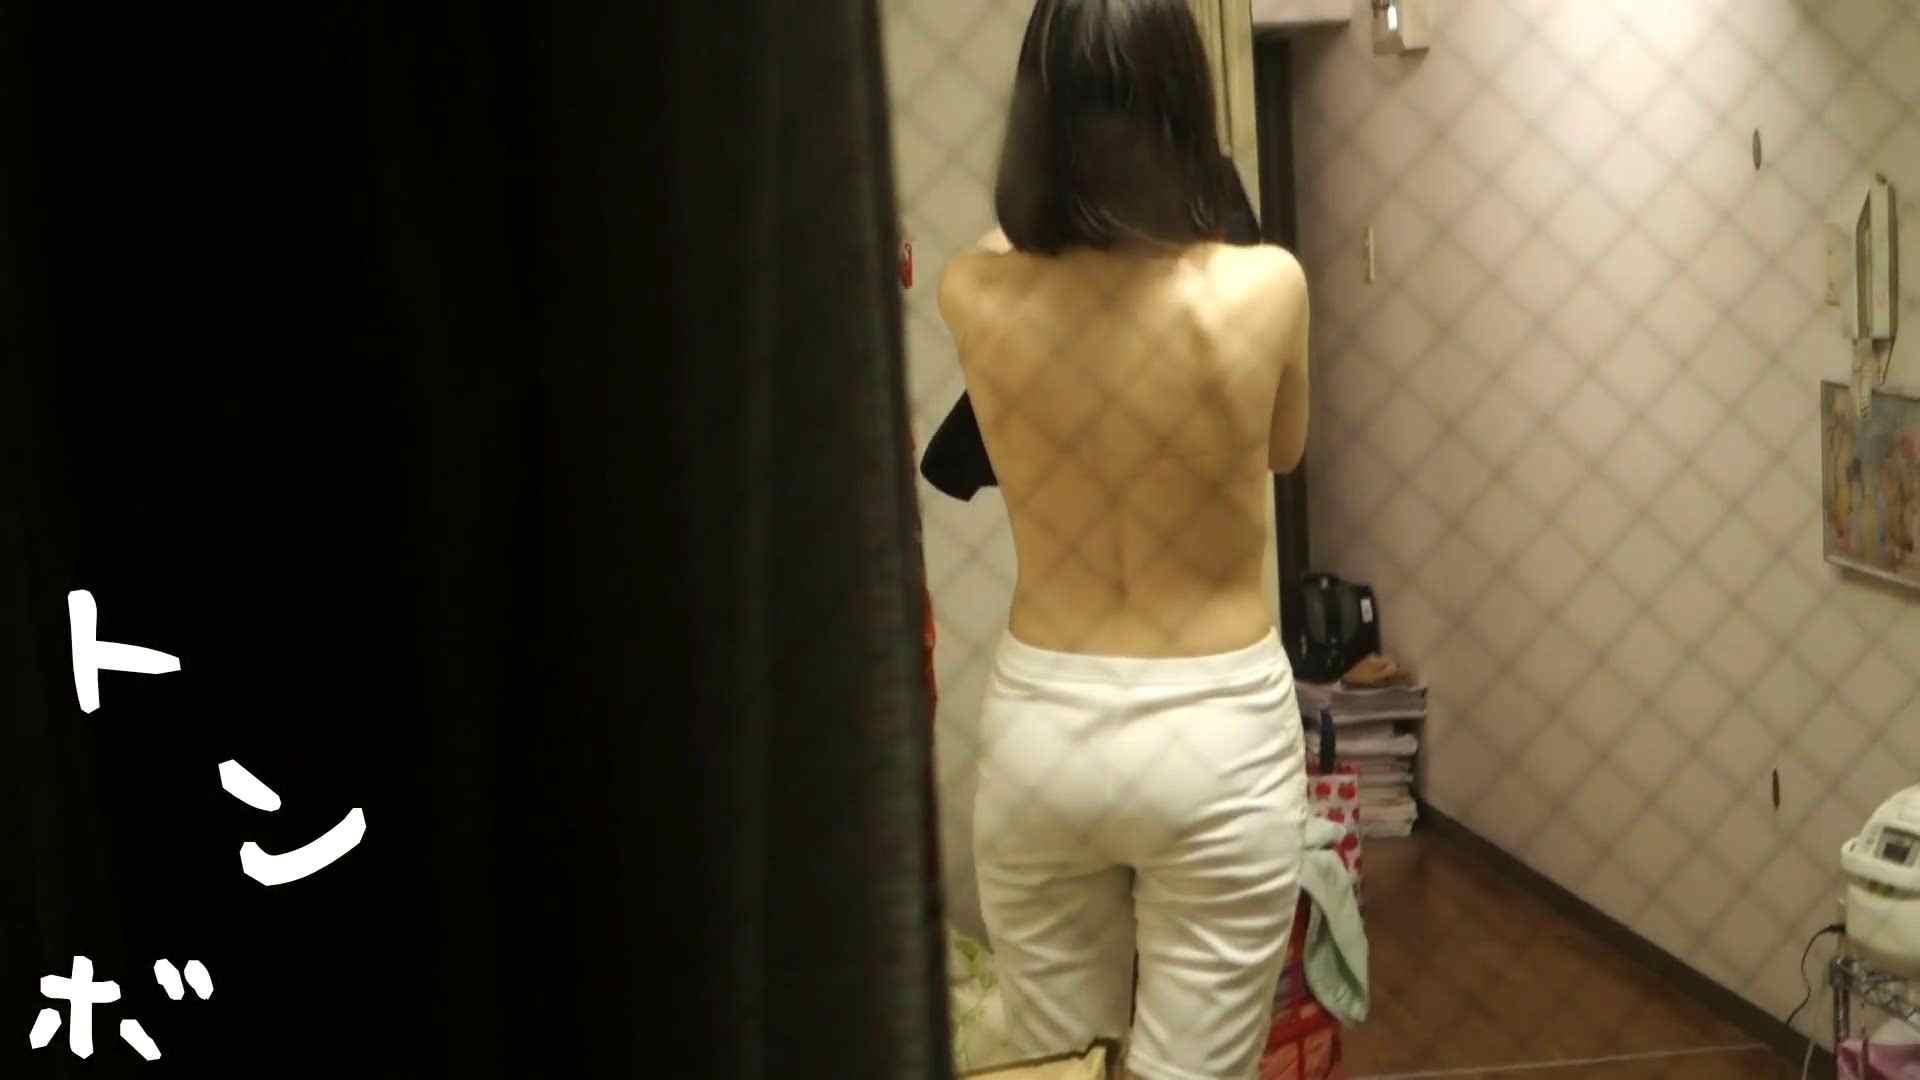 リアル盗撮 S級美女女子大生の私生活② 女子大生 濡れ場動画紹介 88連発 24